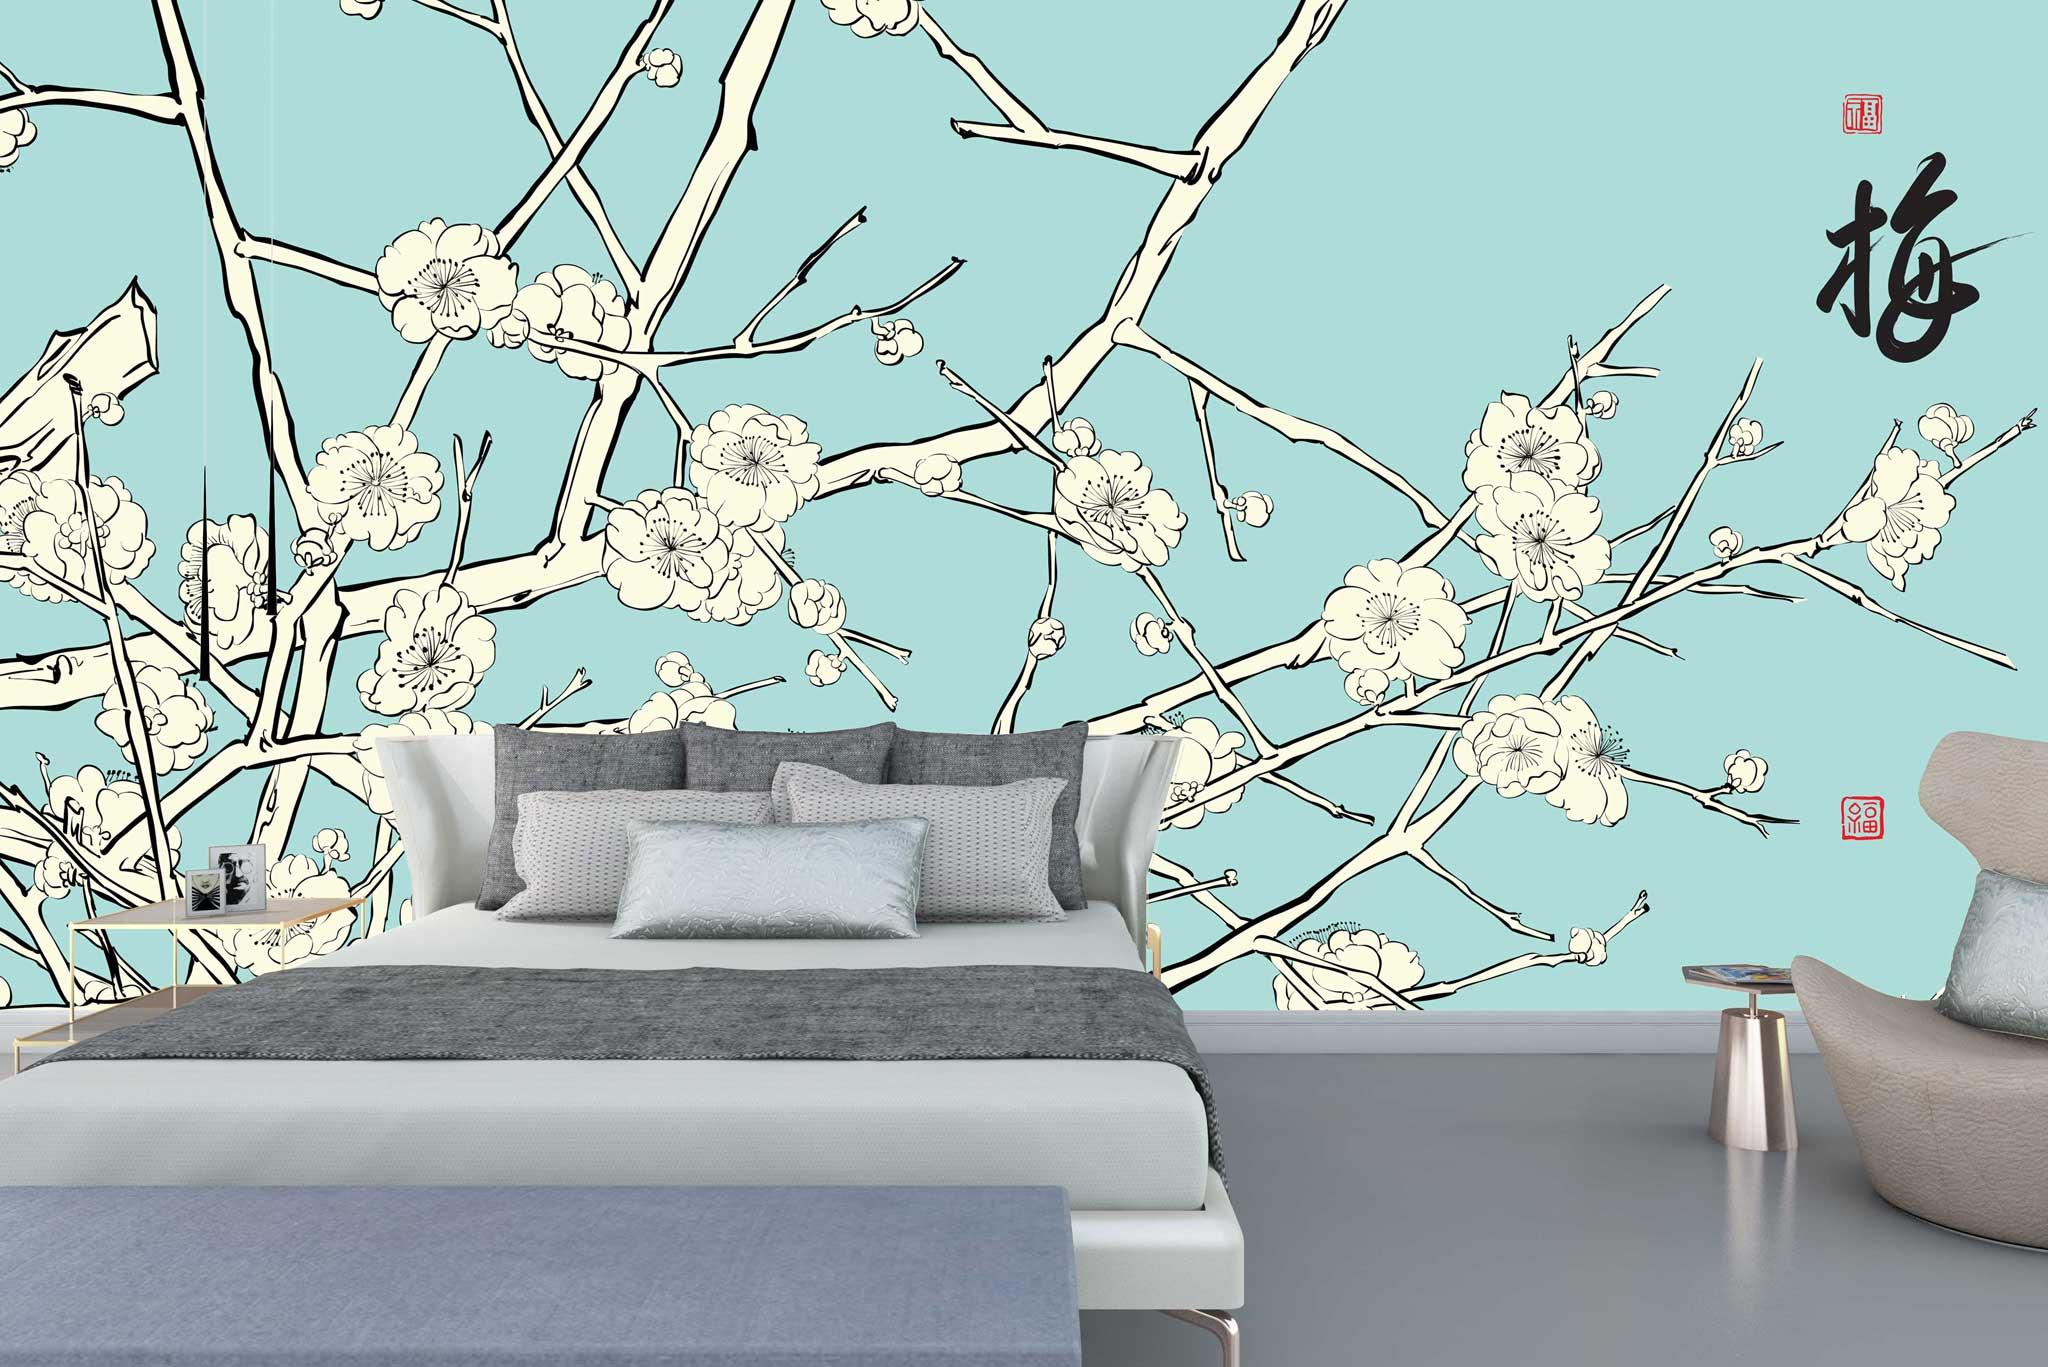 tapet-fototapet-comanda-personalizat-bucuresti-perete-special-lux-model-pictura-desen-stil-asiatic-crengi-flori-cires-alb-bleu